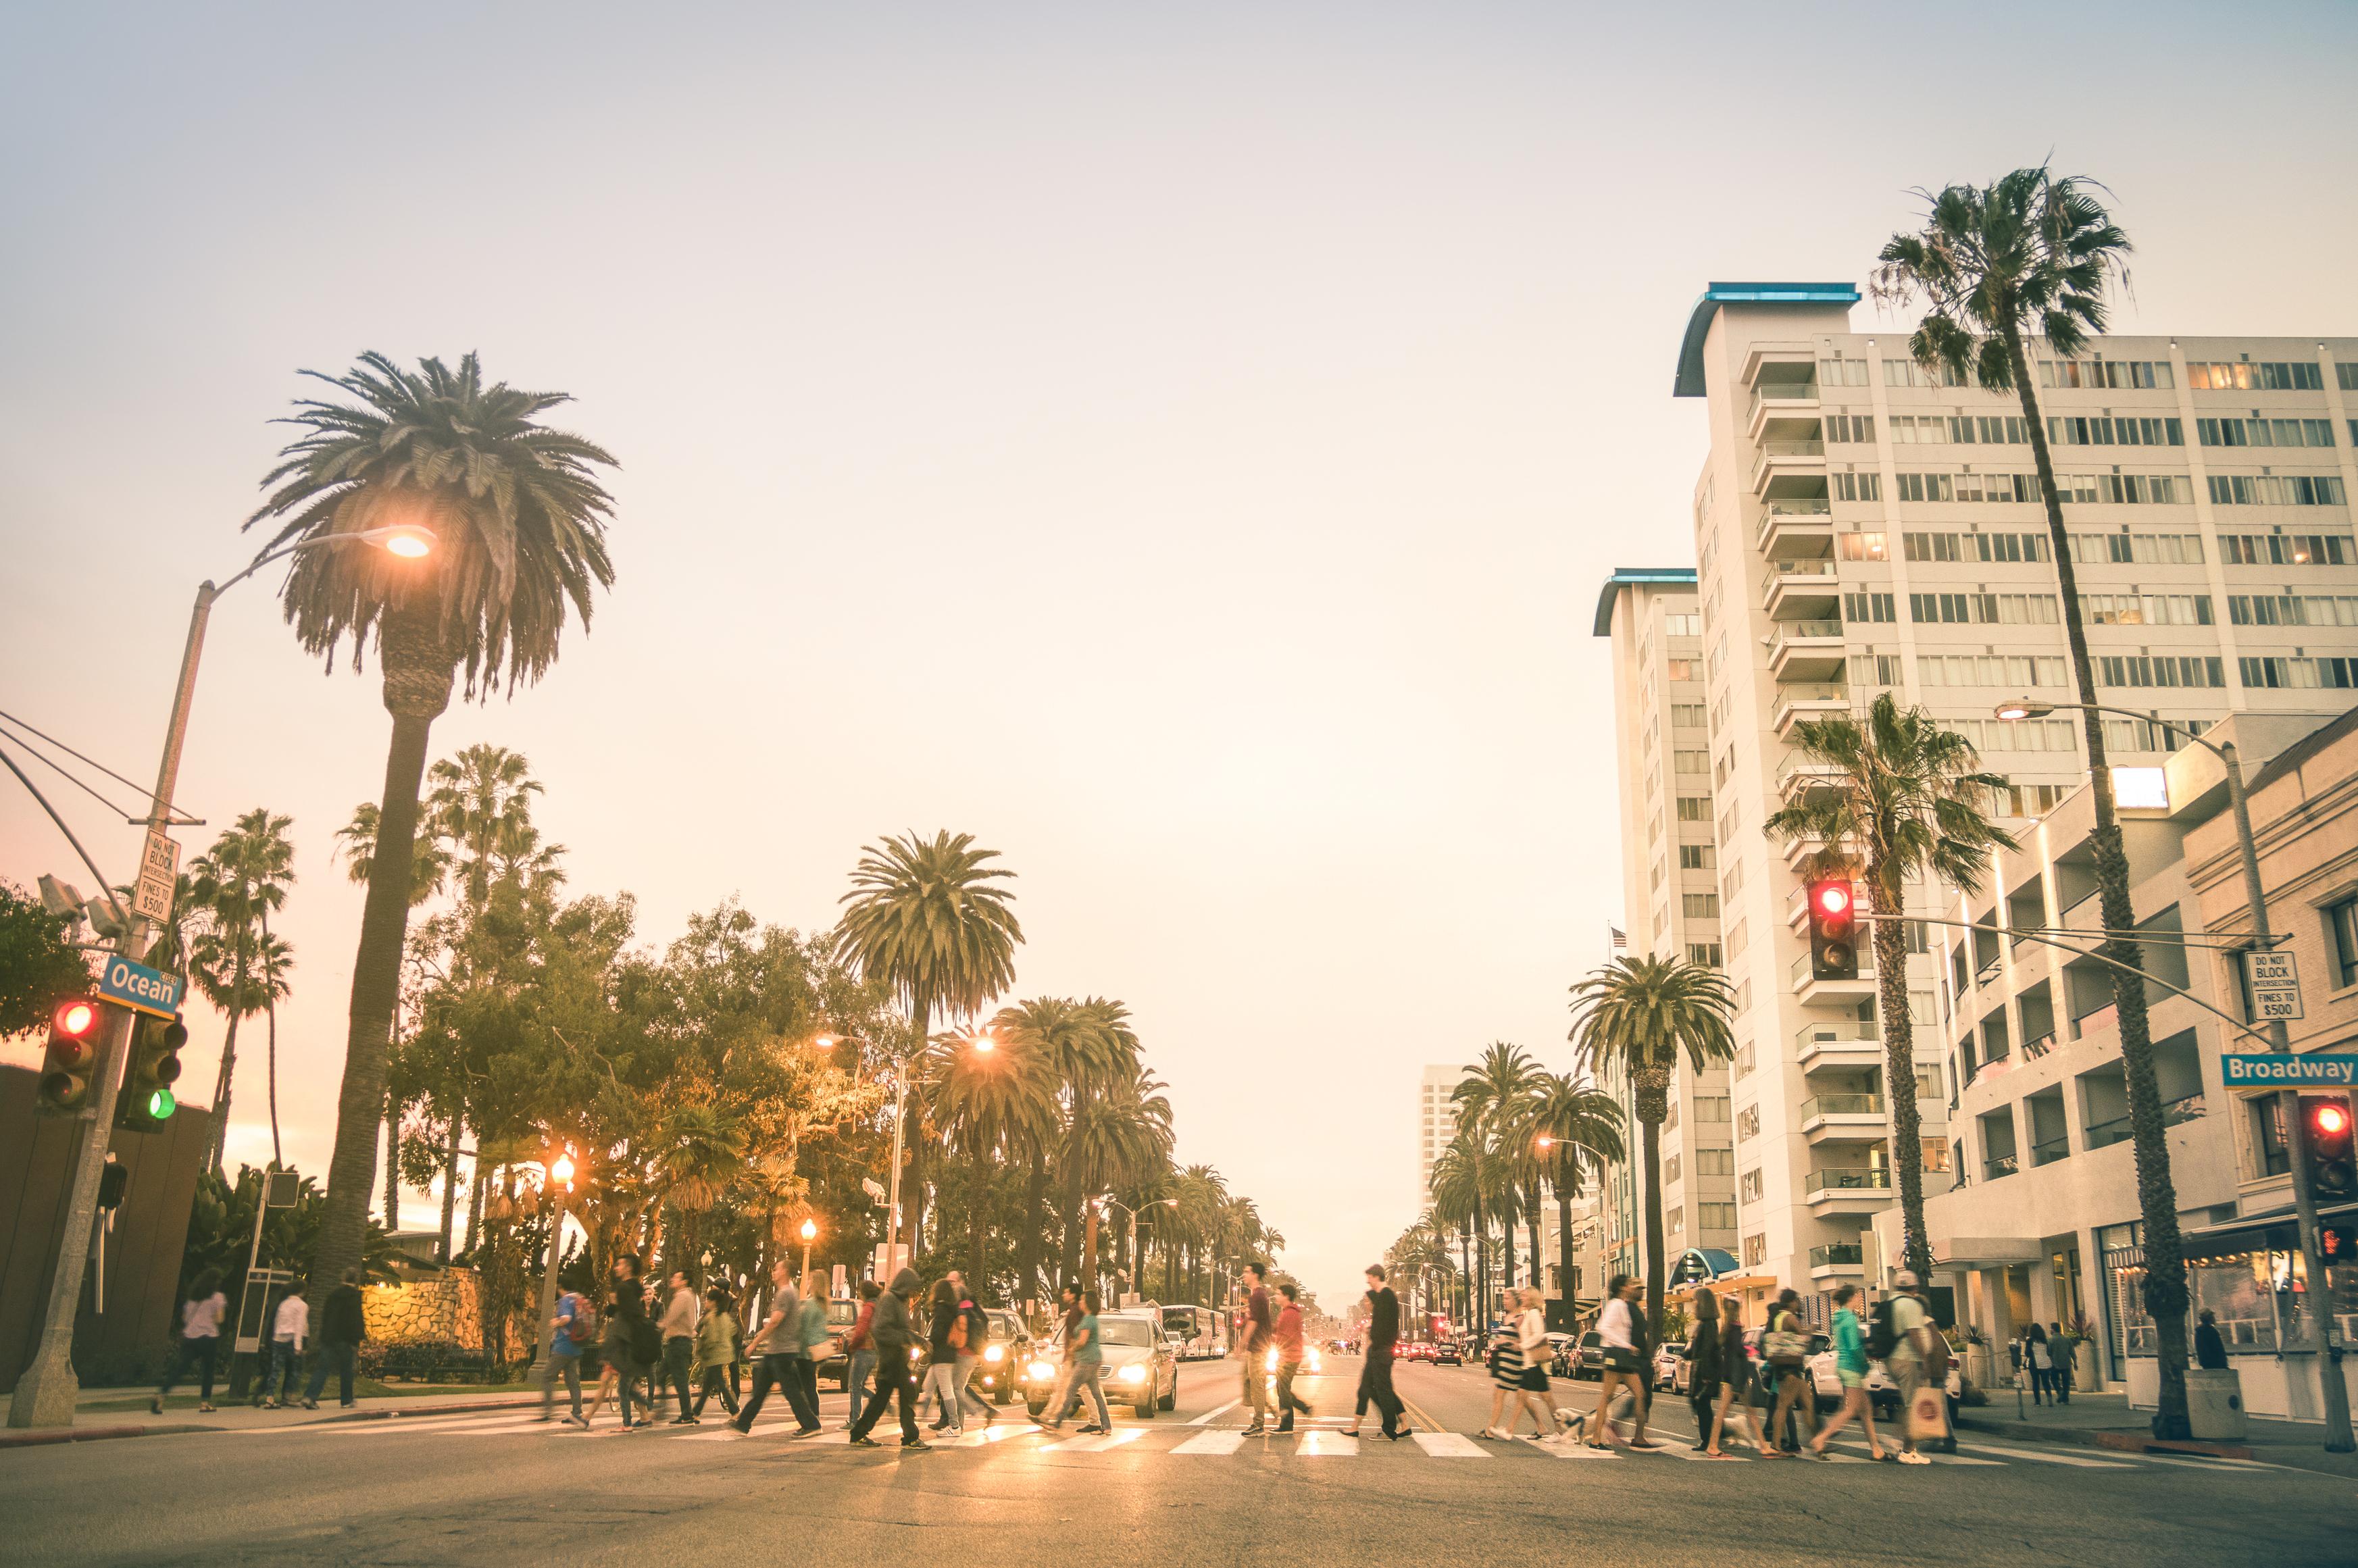 A busy crosswalk in Santa Monica, California.